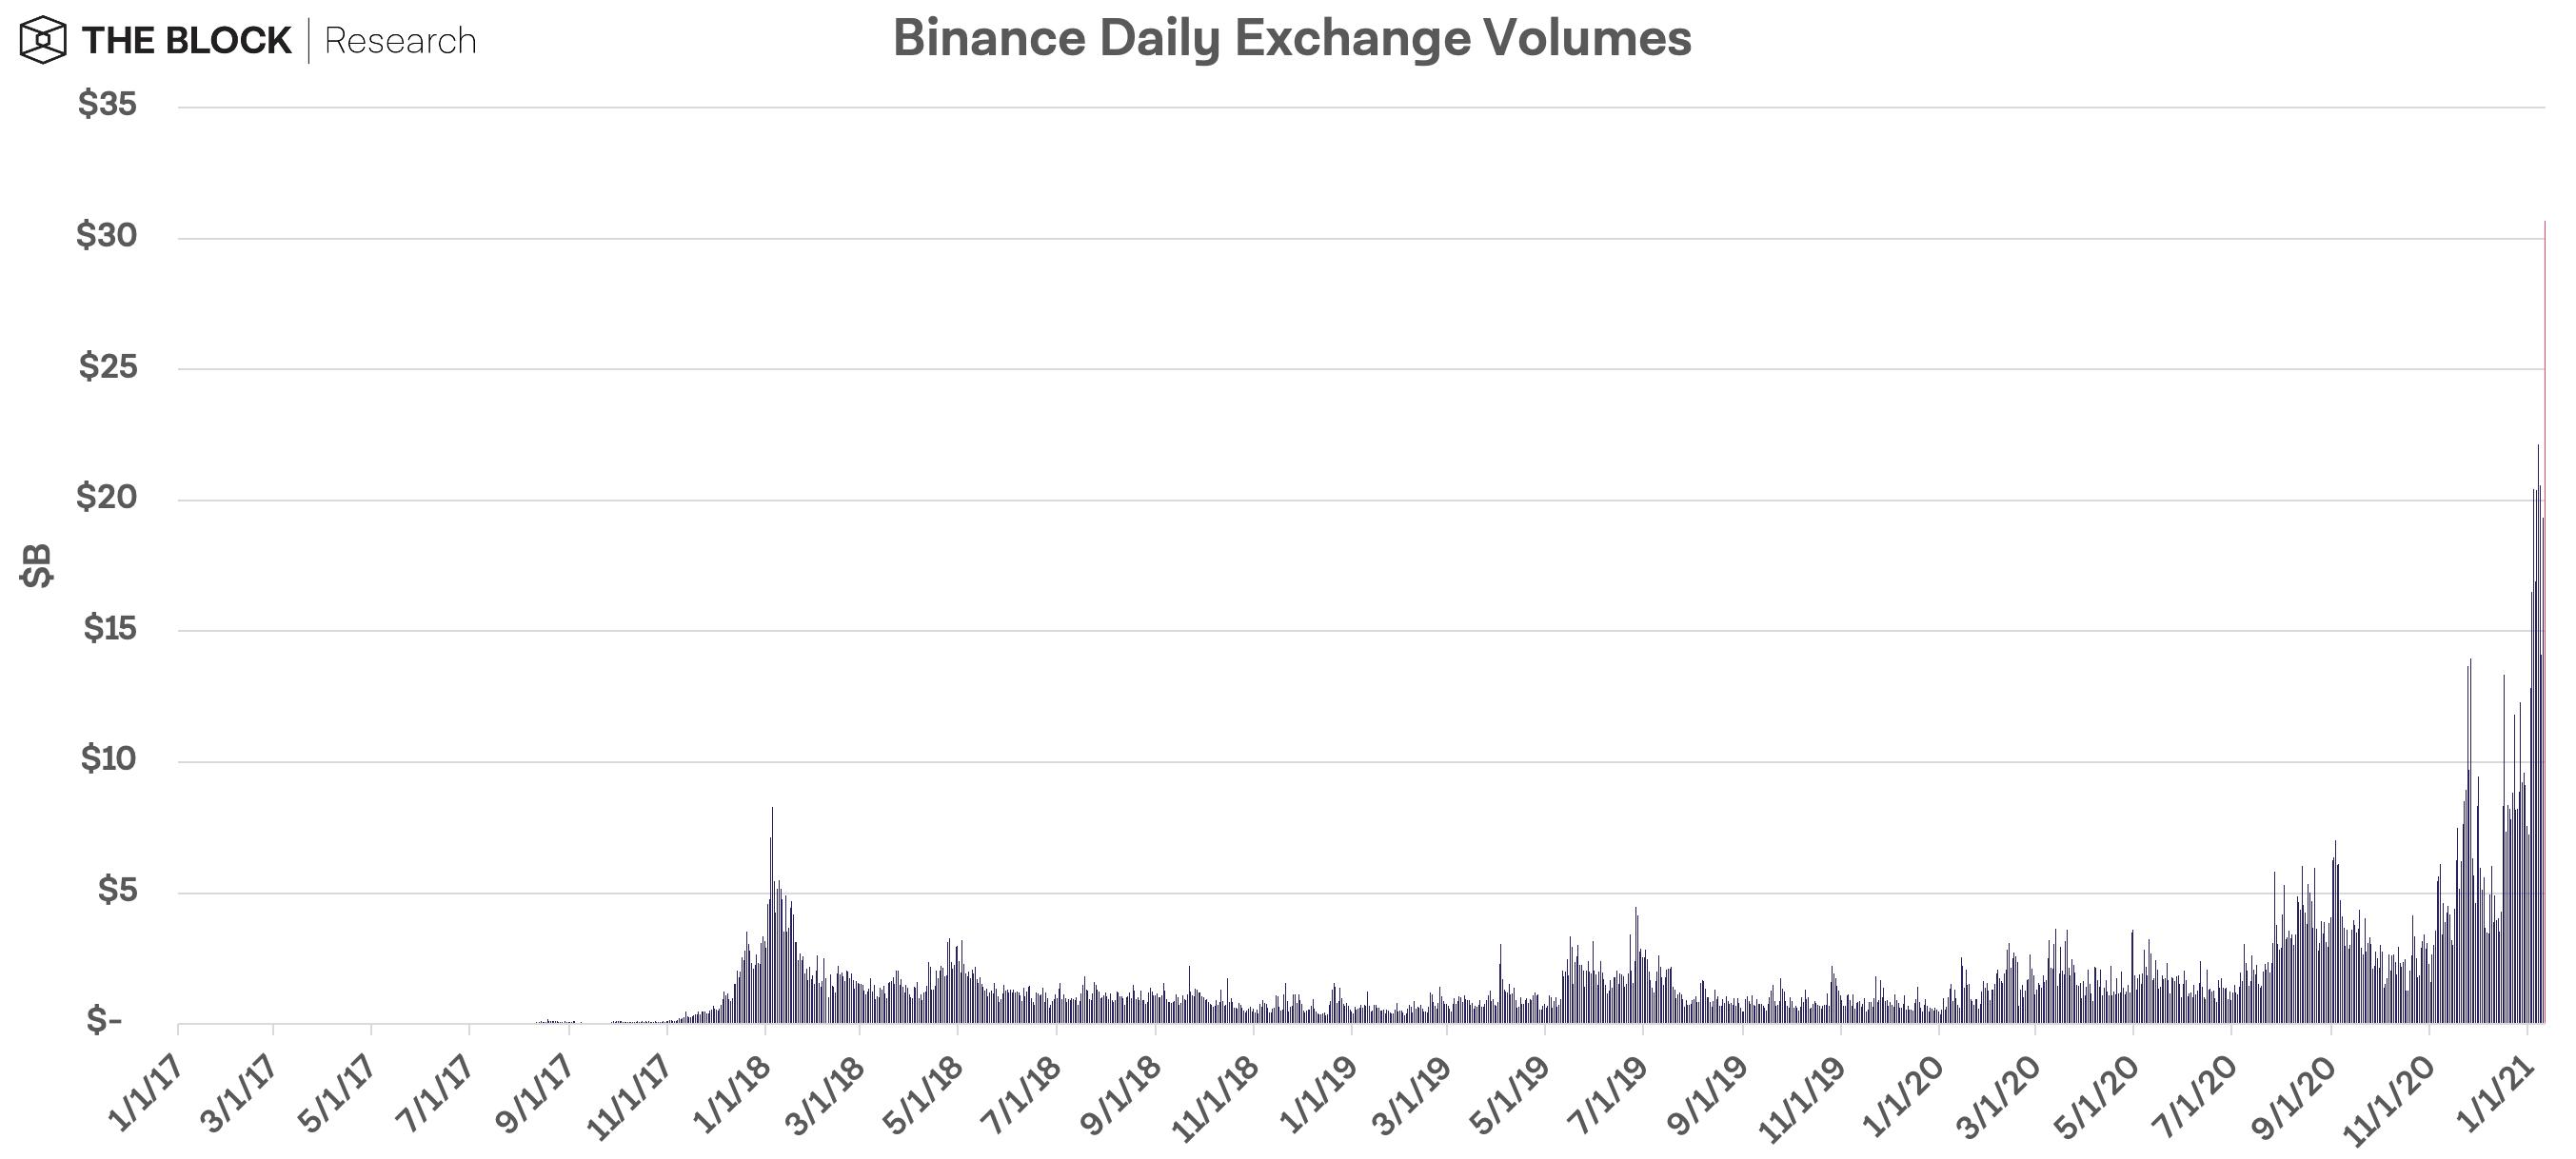 Binance - شکست رکورد حجم معاملات روزانه صرافیهای رمزنگاری Coinbase و Binance